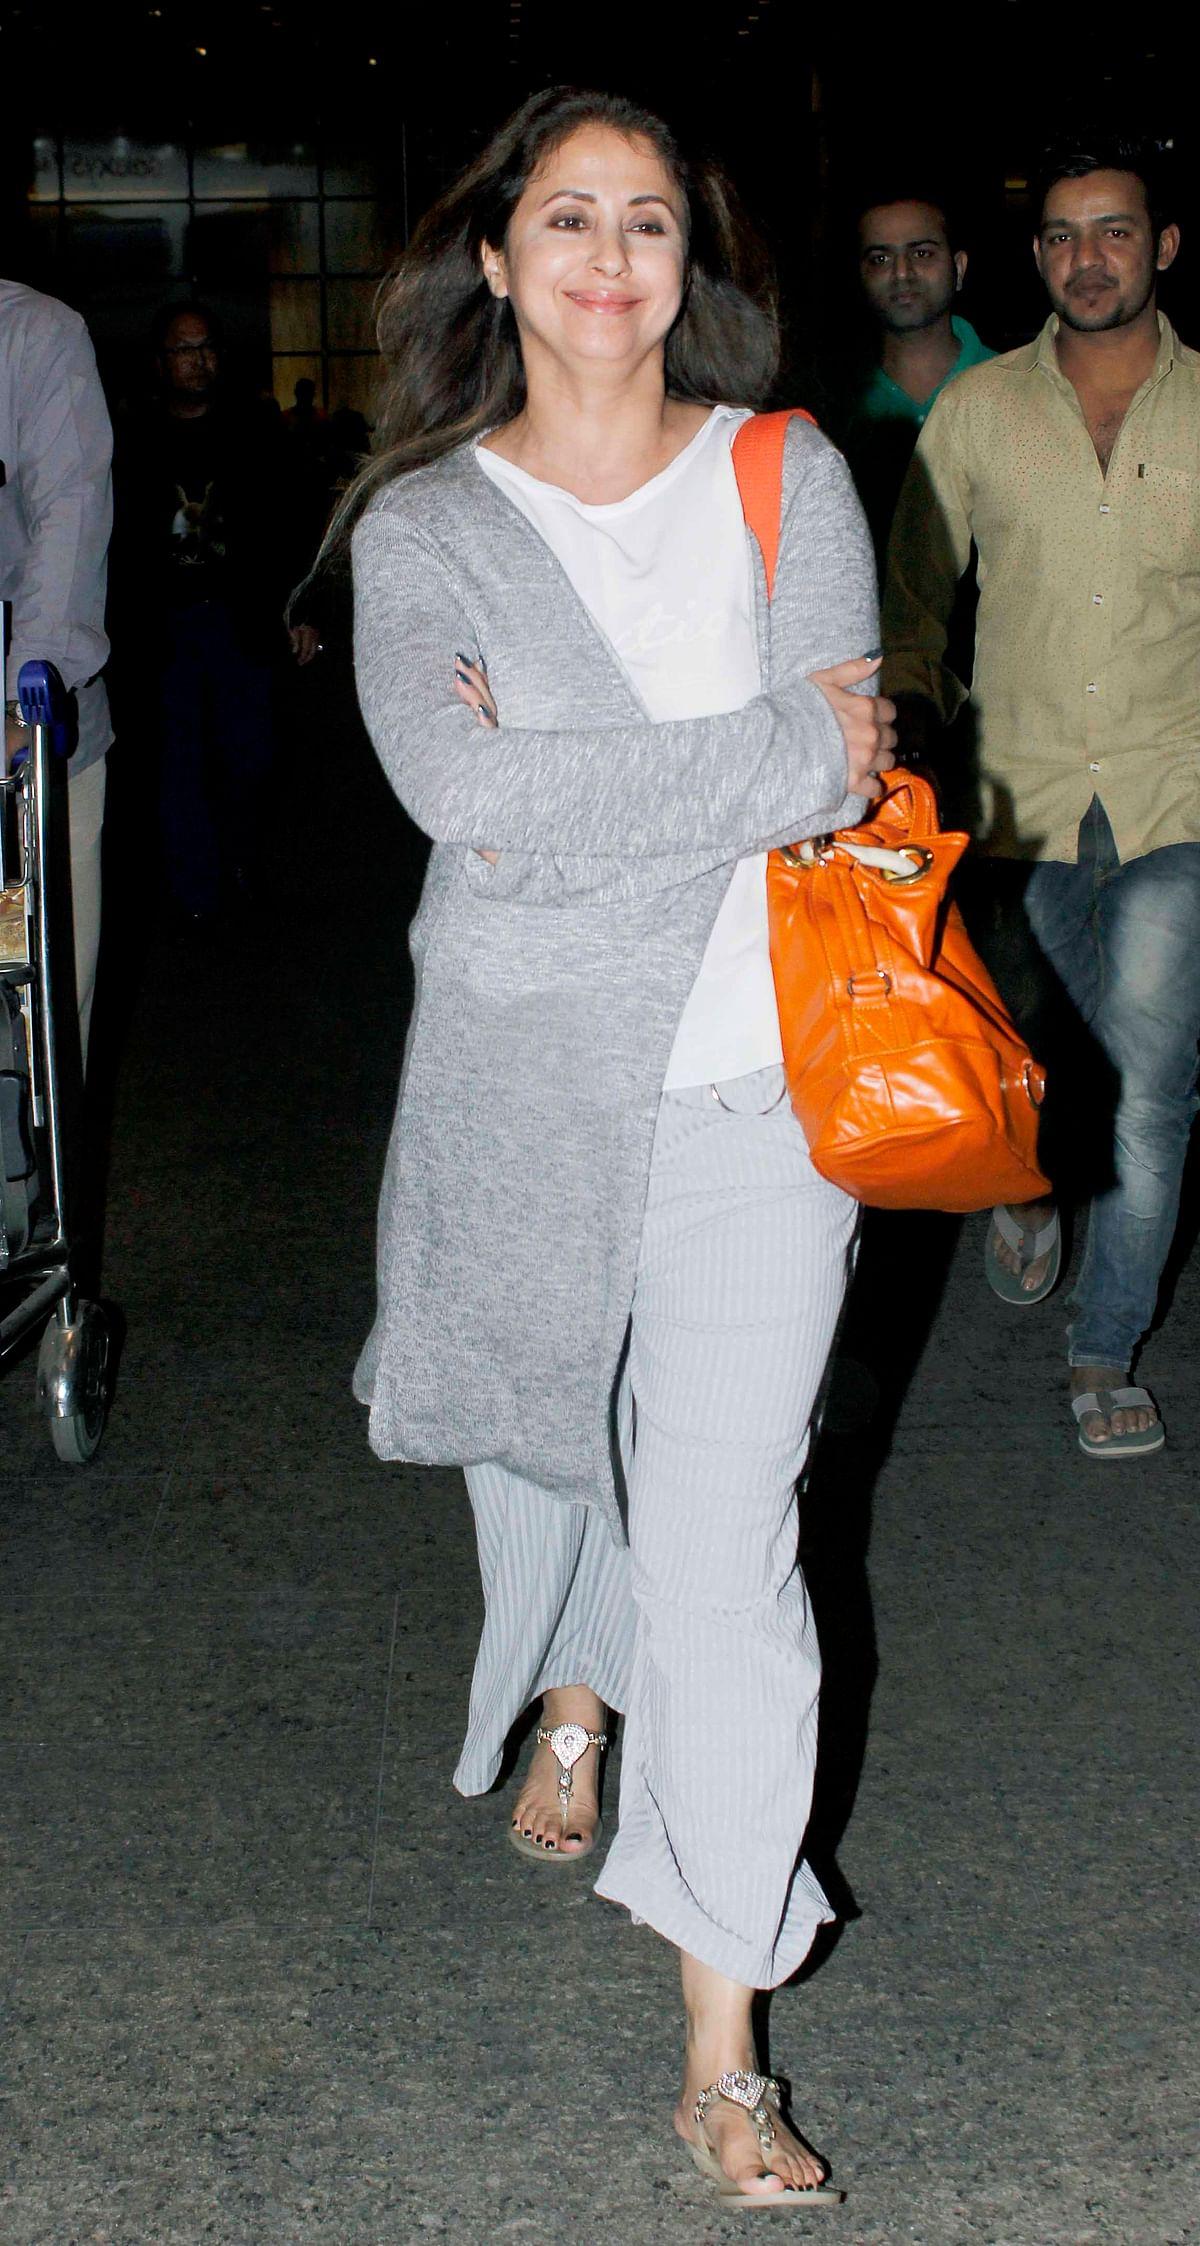 We also spotted Urmila Matondkar at the airport. (Photo: Yogen Shah)